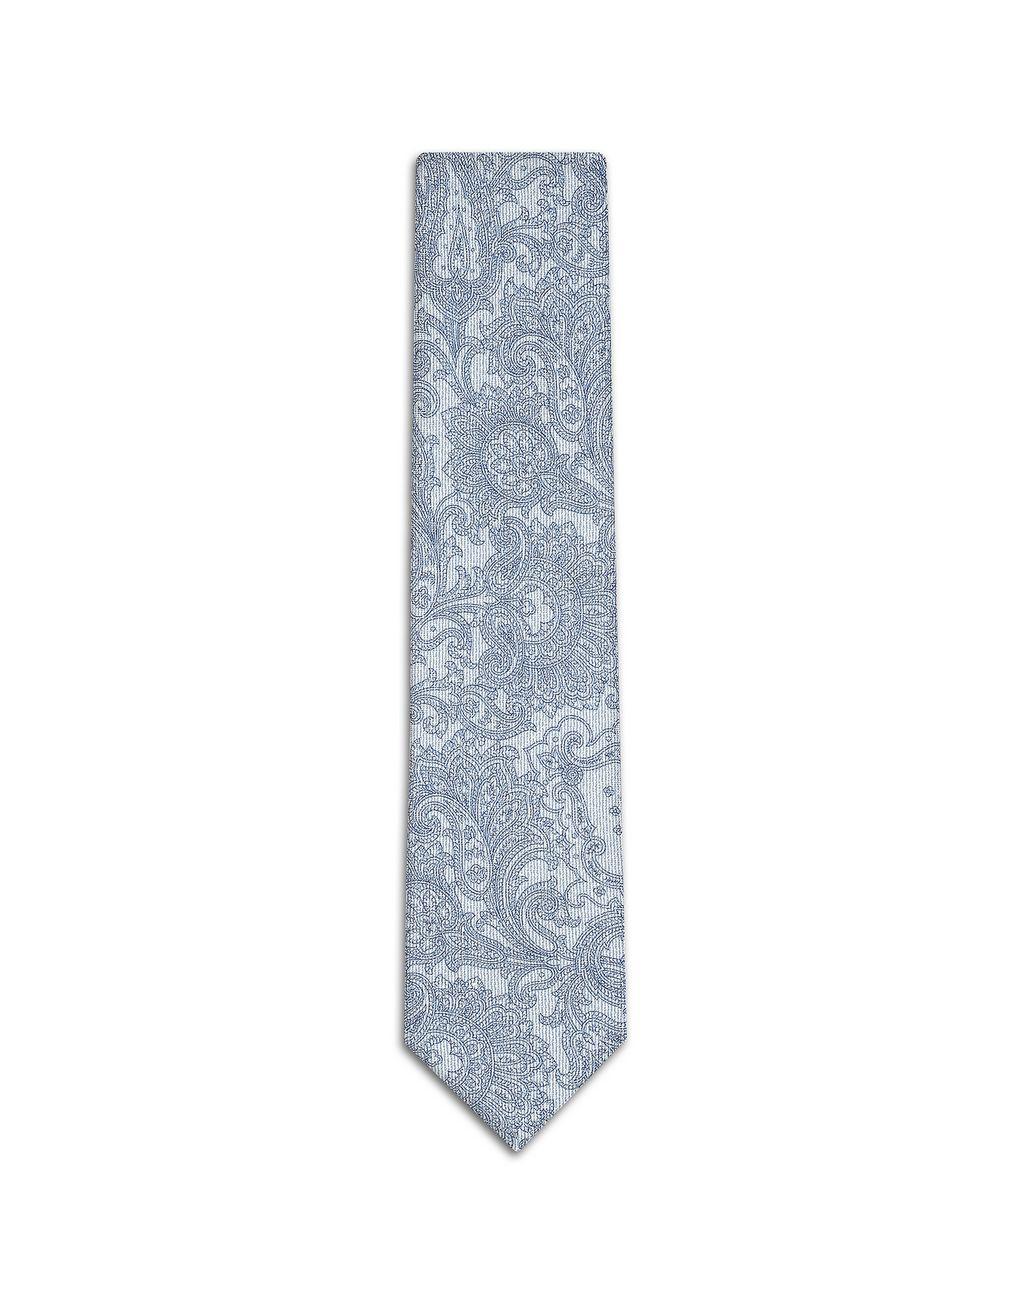 BRIONI Bluette Paisley Tie Tie Man f